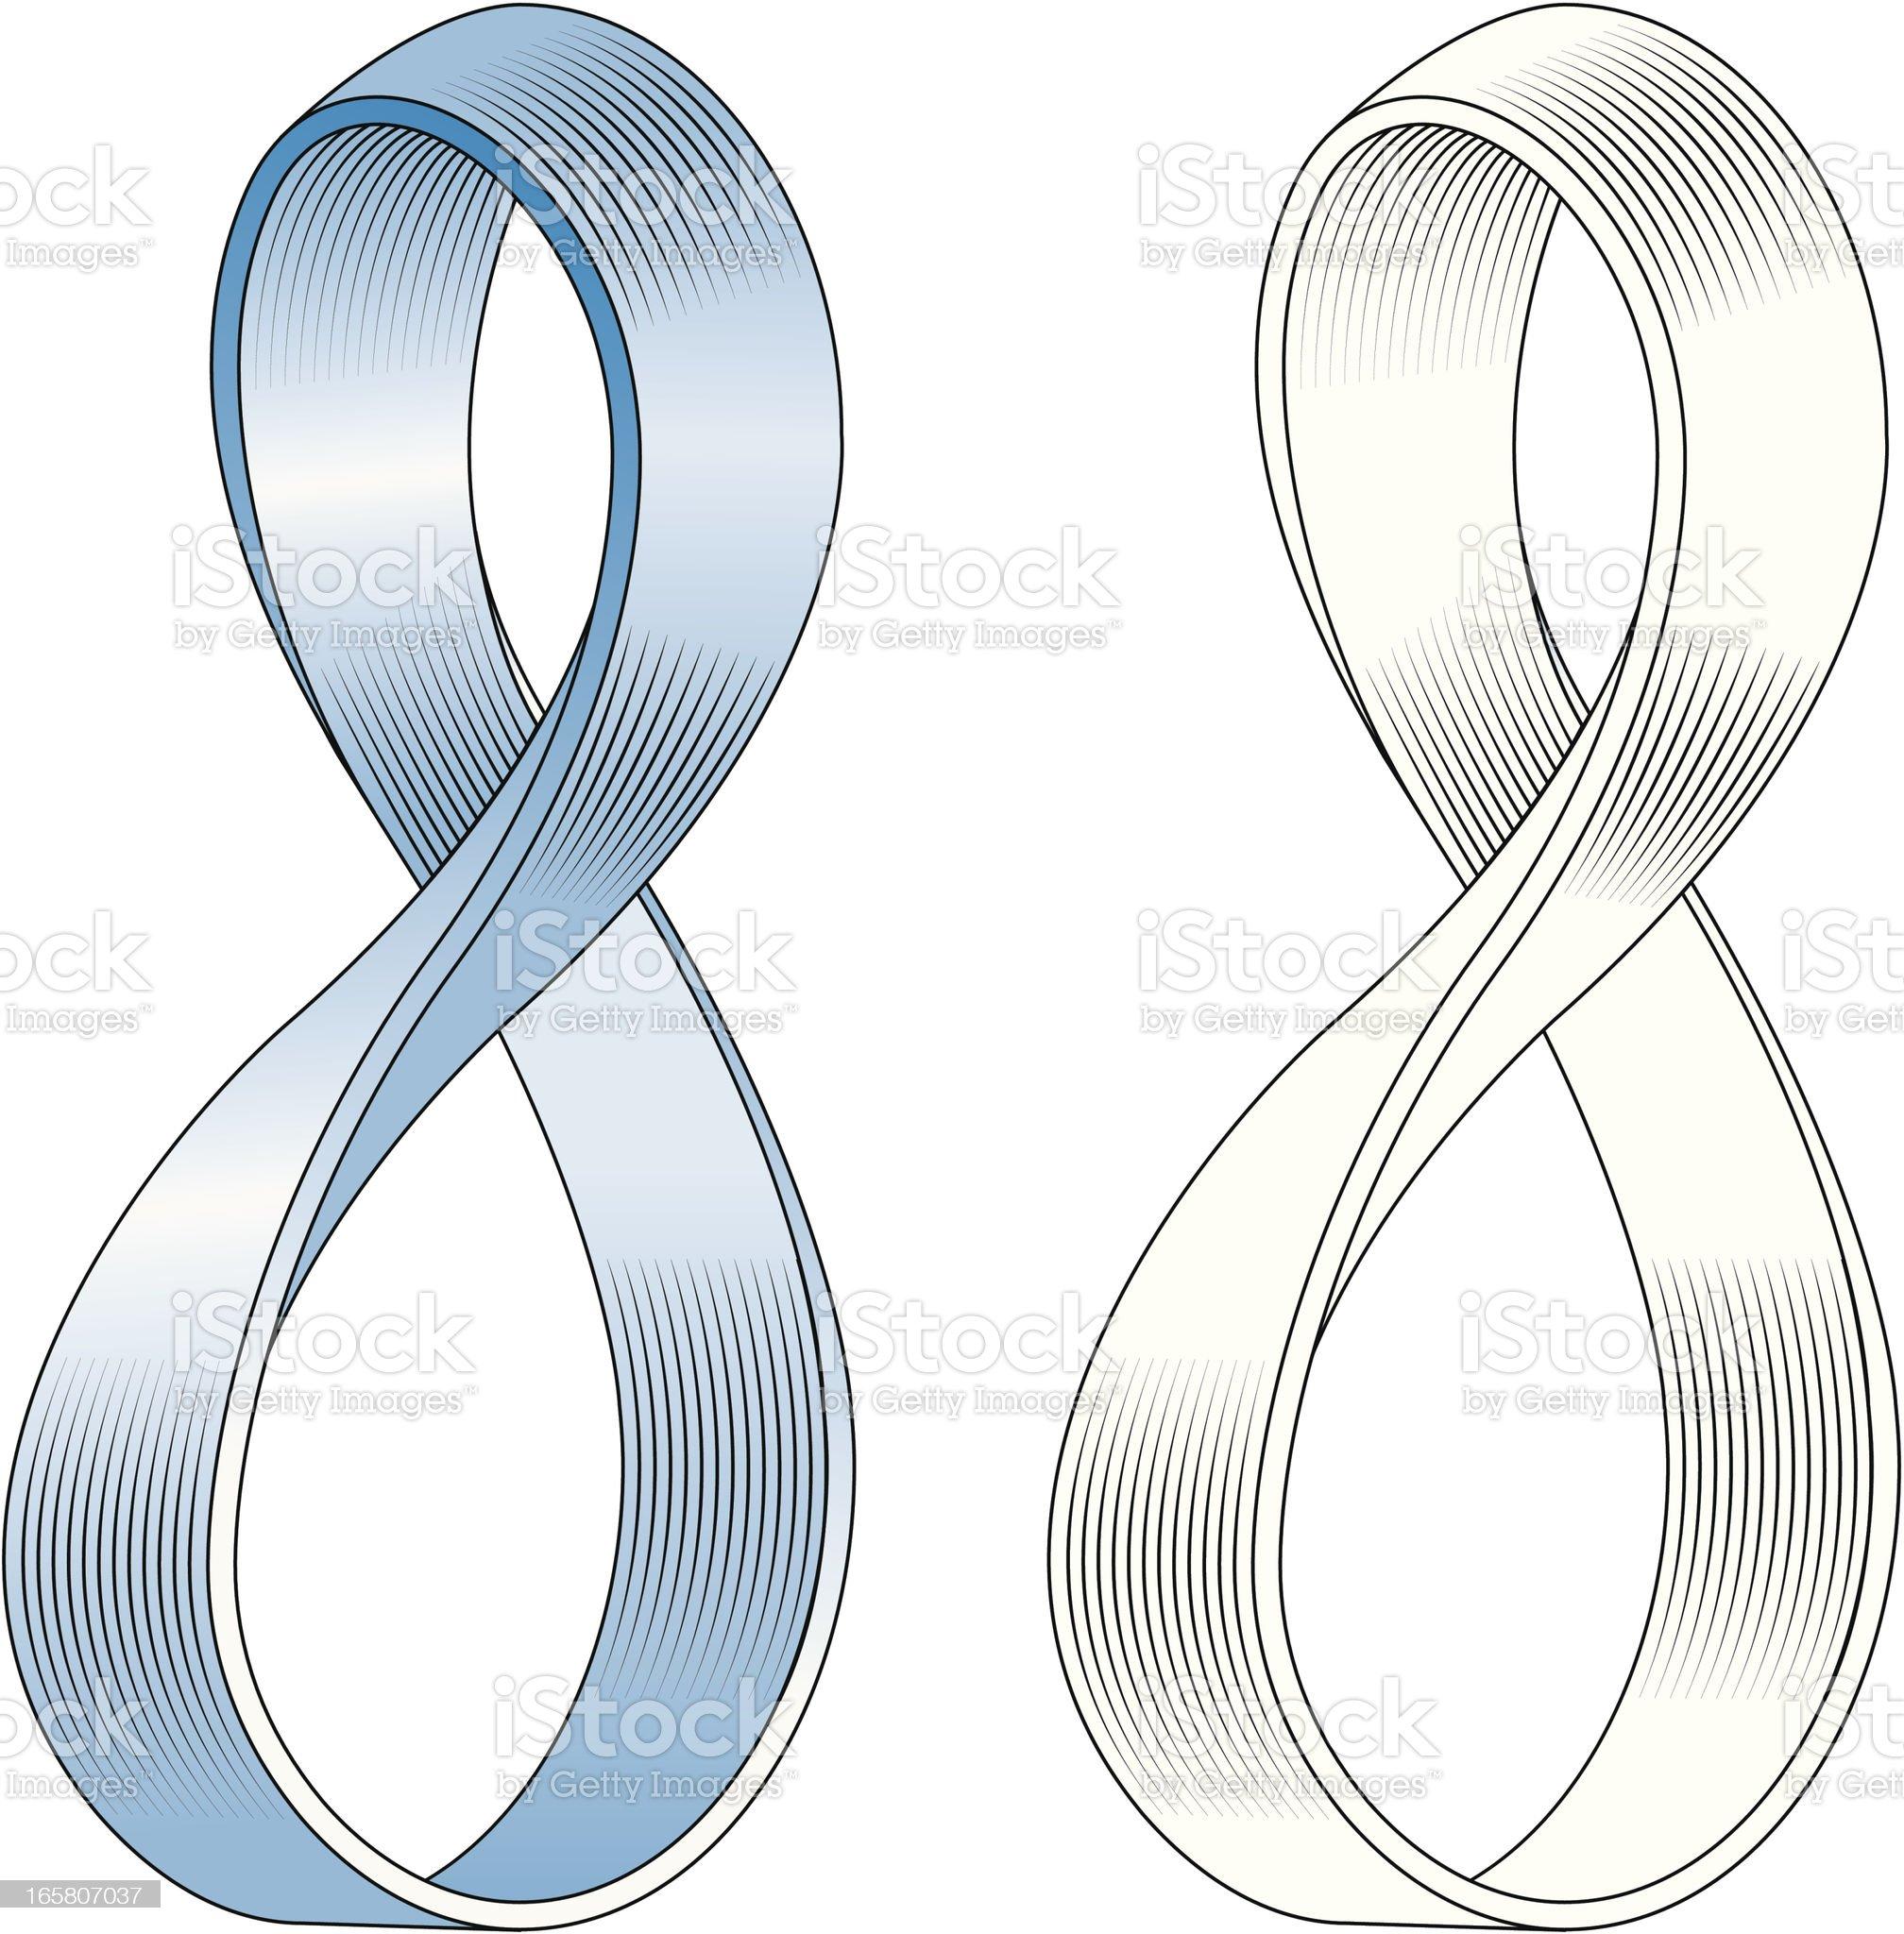 Mobius strip royalty-free stock vector art